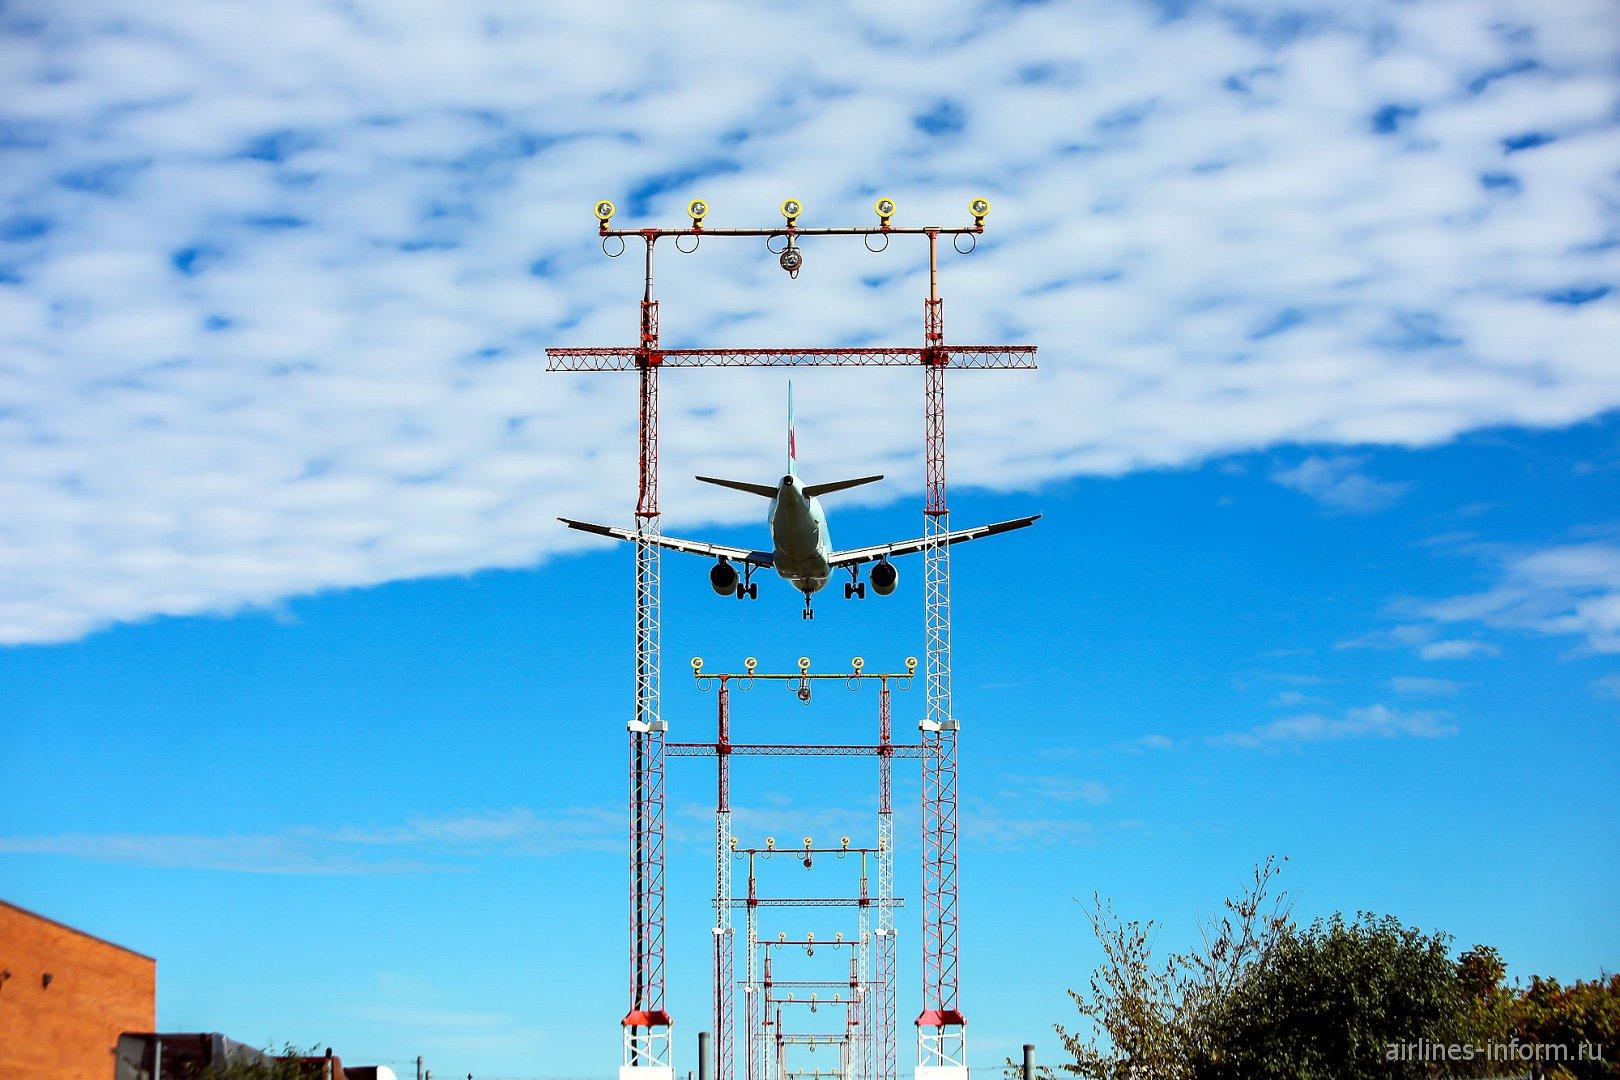 Посадка Airbus A320 в аэропорту Торонто Пирсон